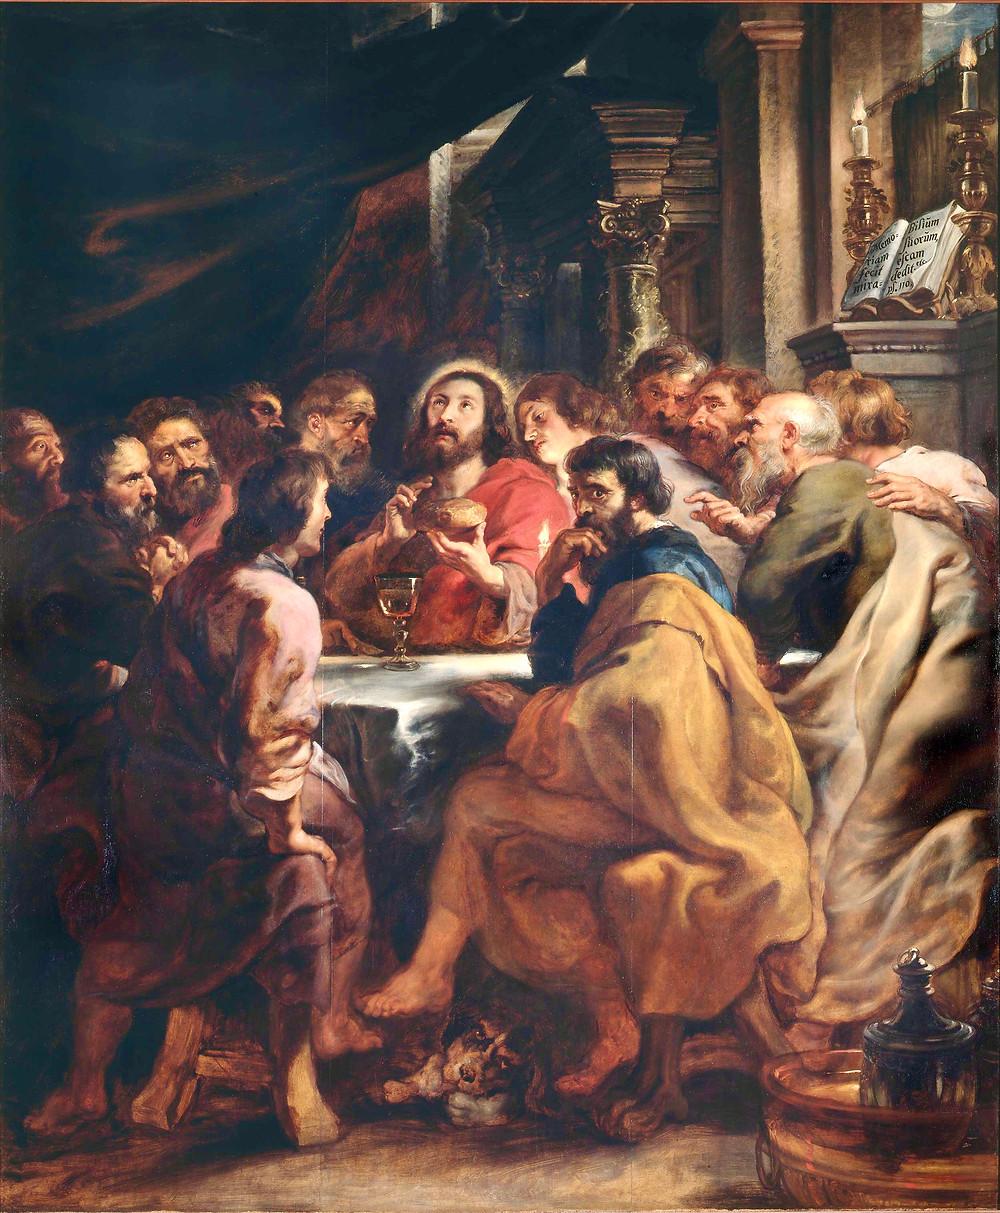 Peter Paul Rubens, The Last Supper, 1632